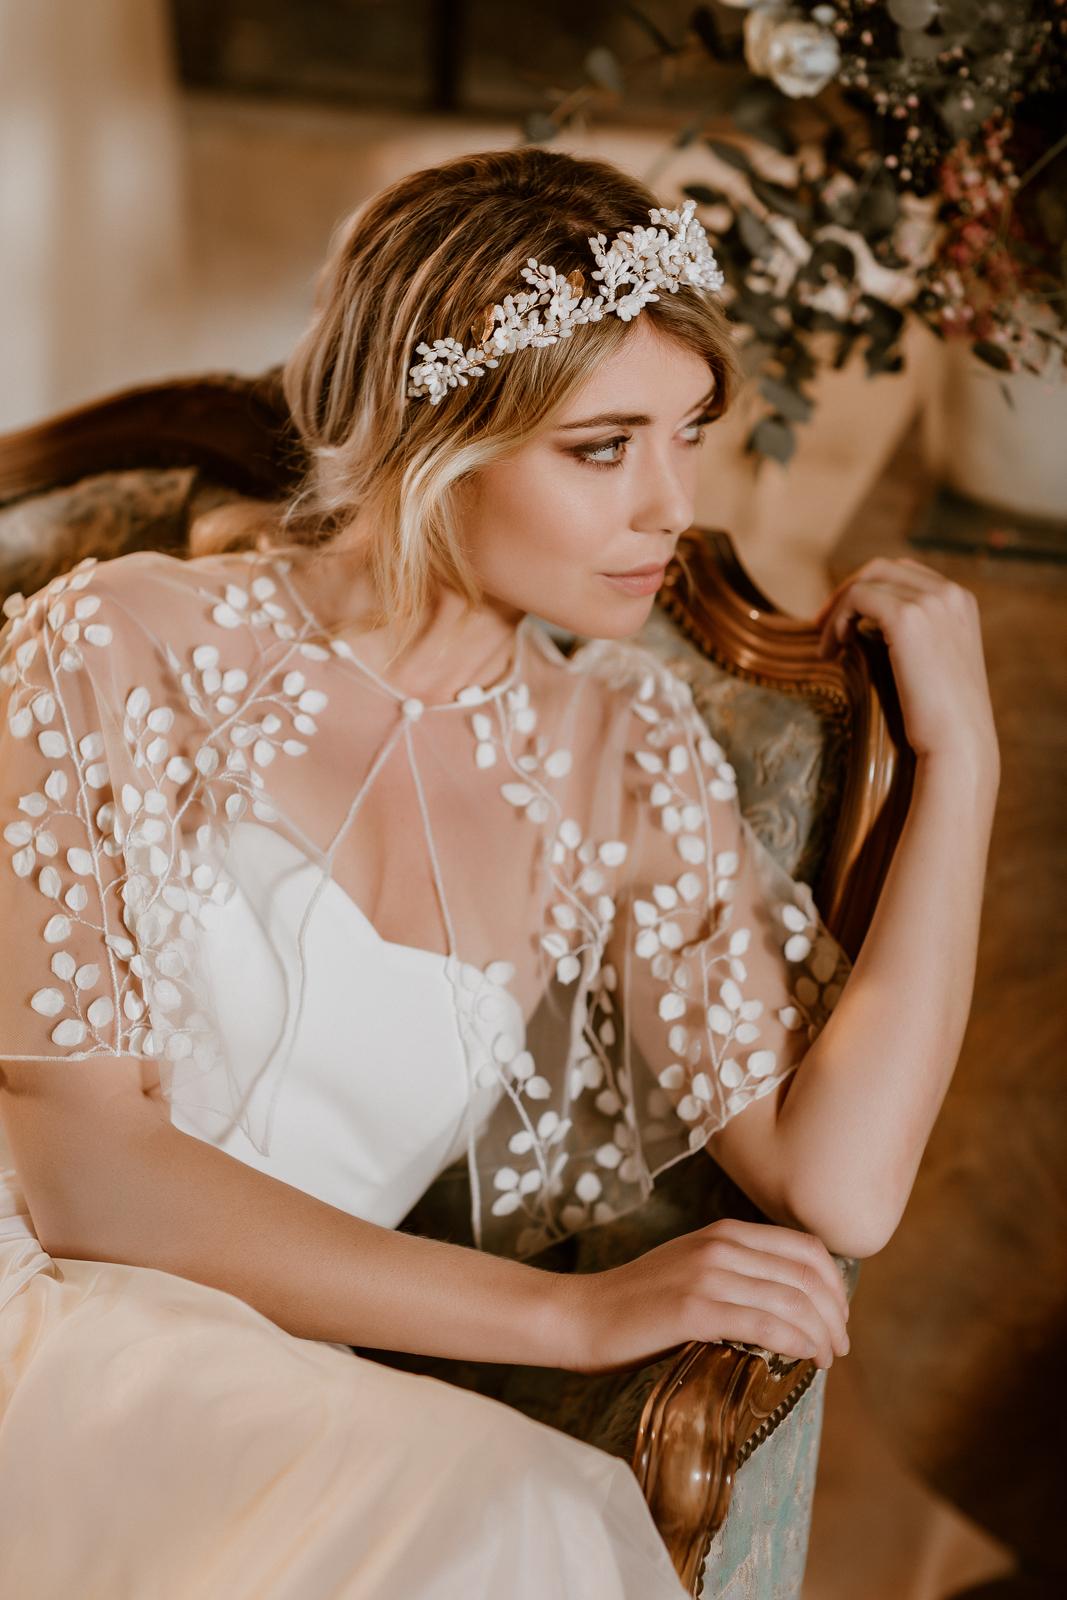 noni Jubiläumskollektion | Transparentes Brautcape aus feiner Spitze mit zarten 3D-Blüten, Detailansicht (Foto: Le Hai Linh)